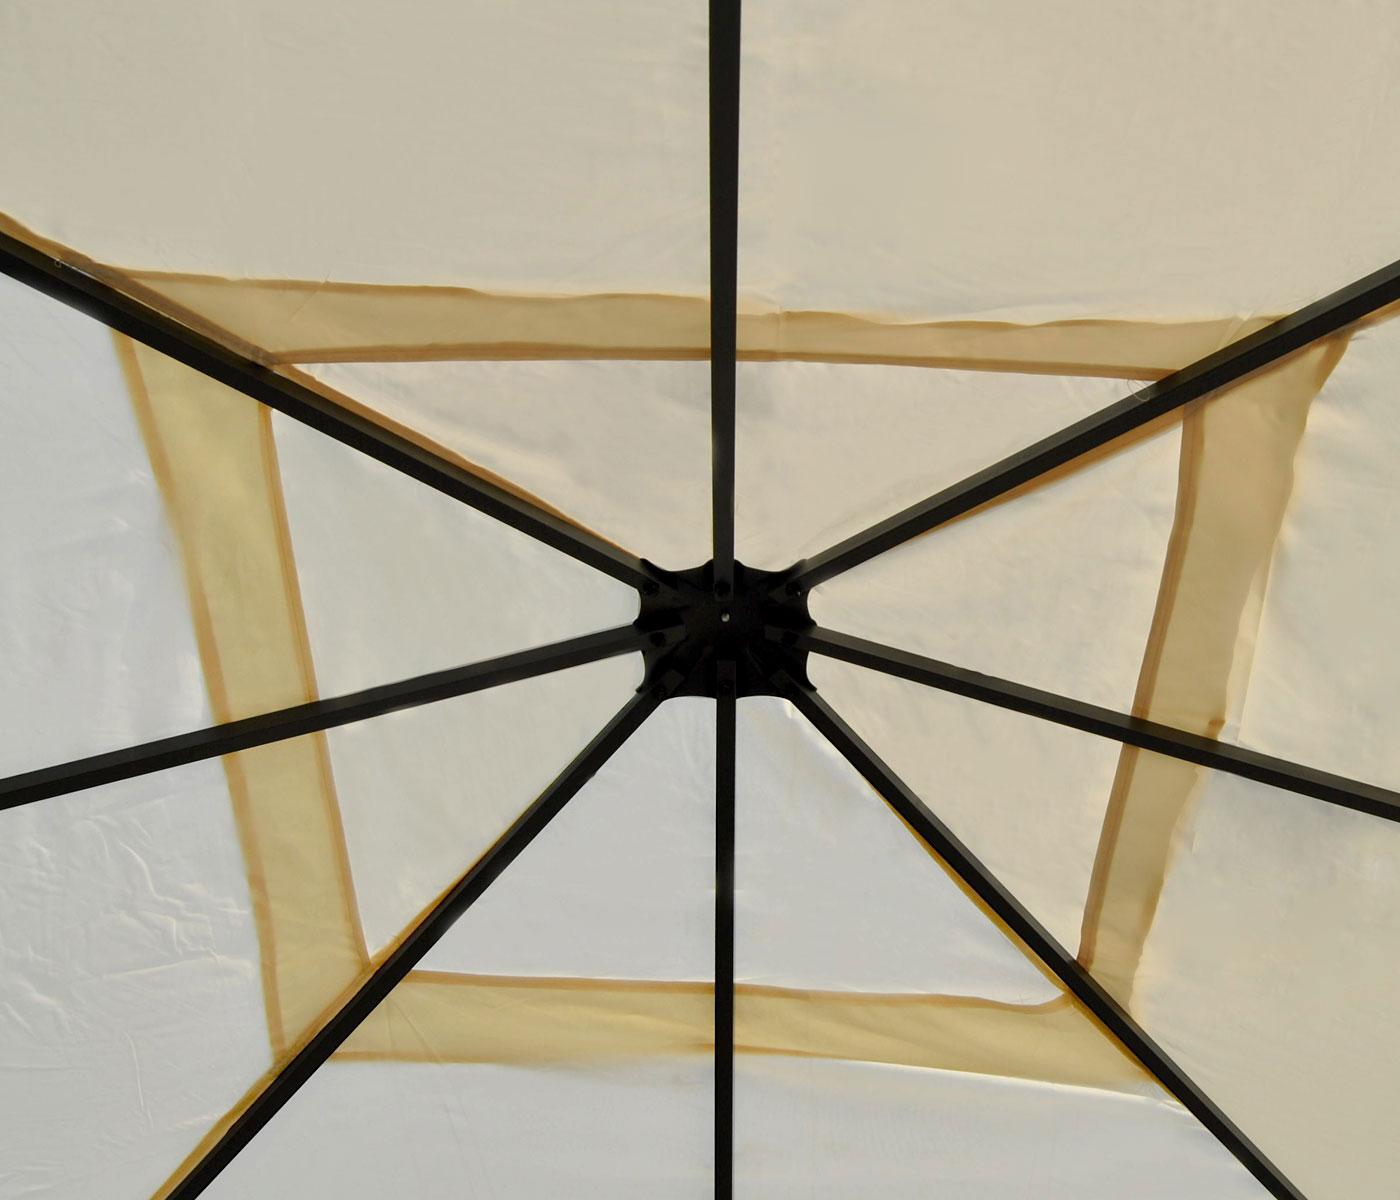 Ersatzdach für Pergola Cadiz